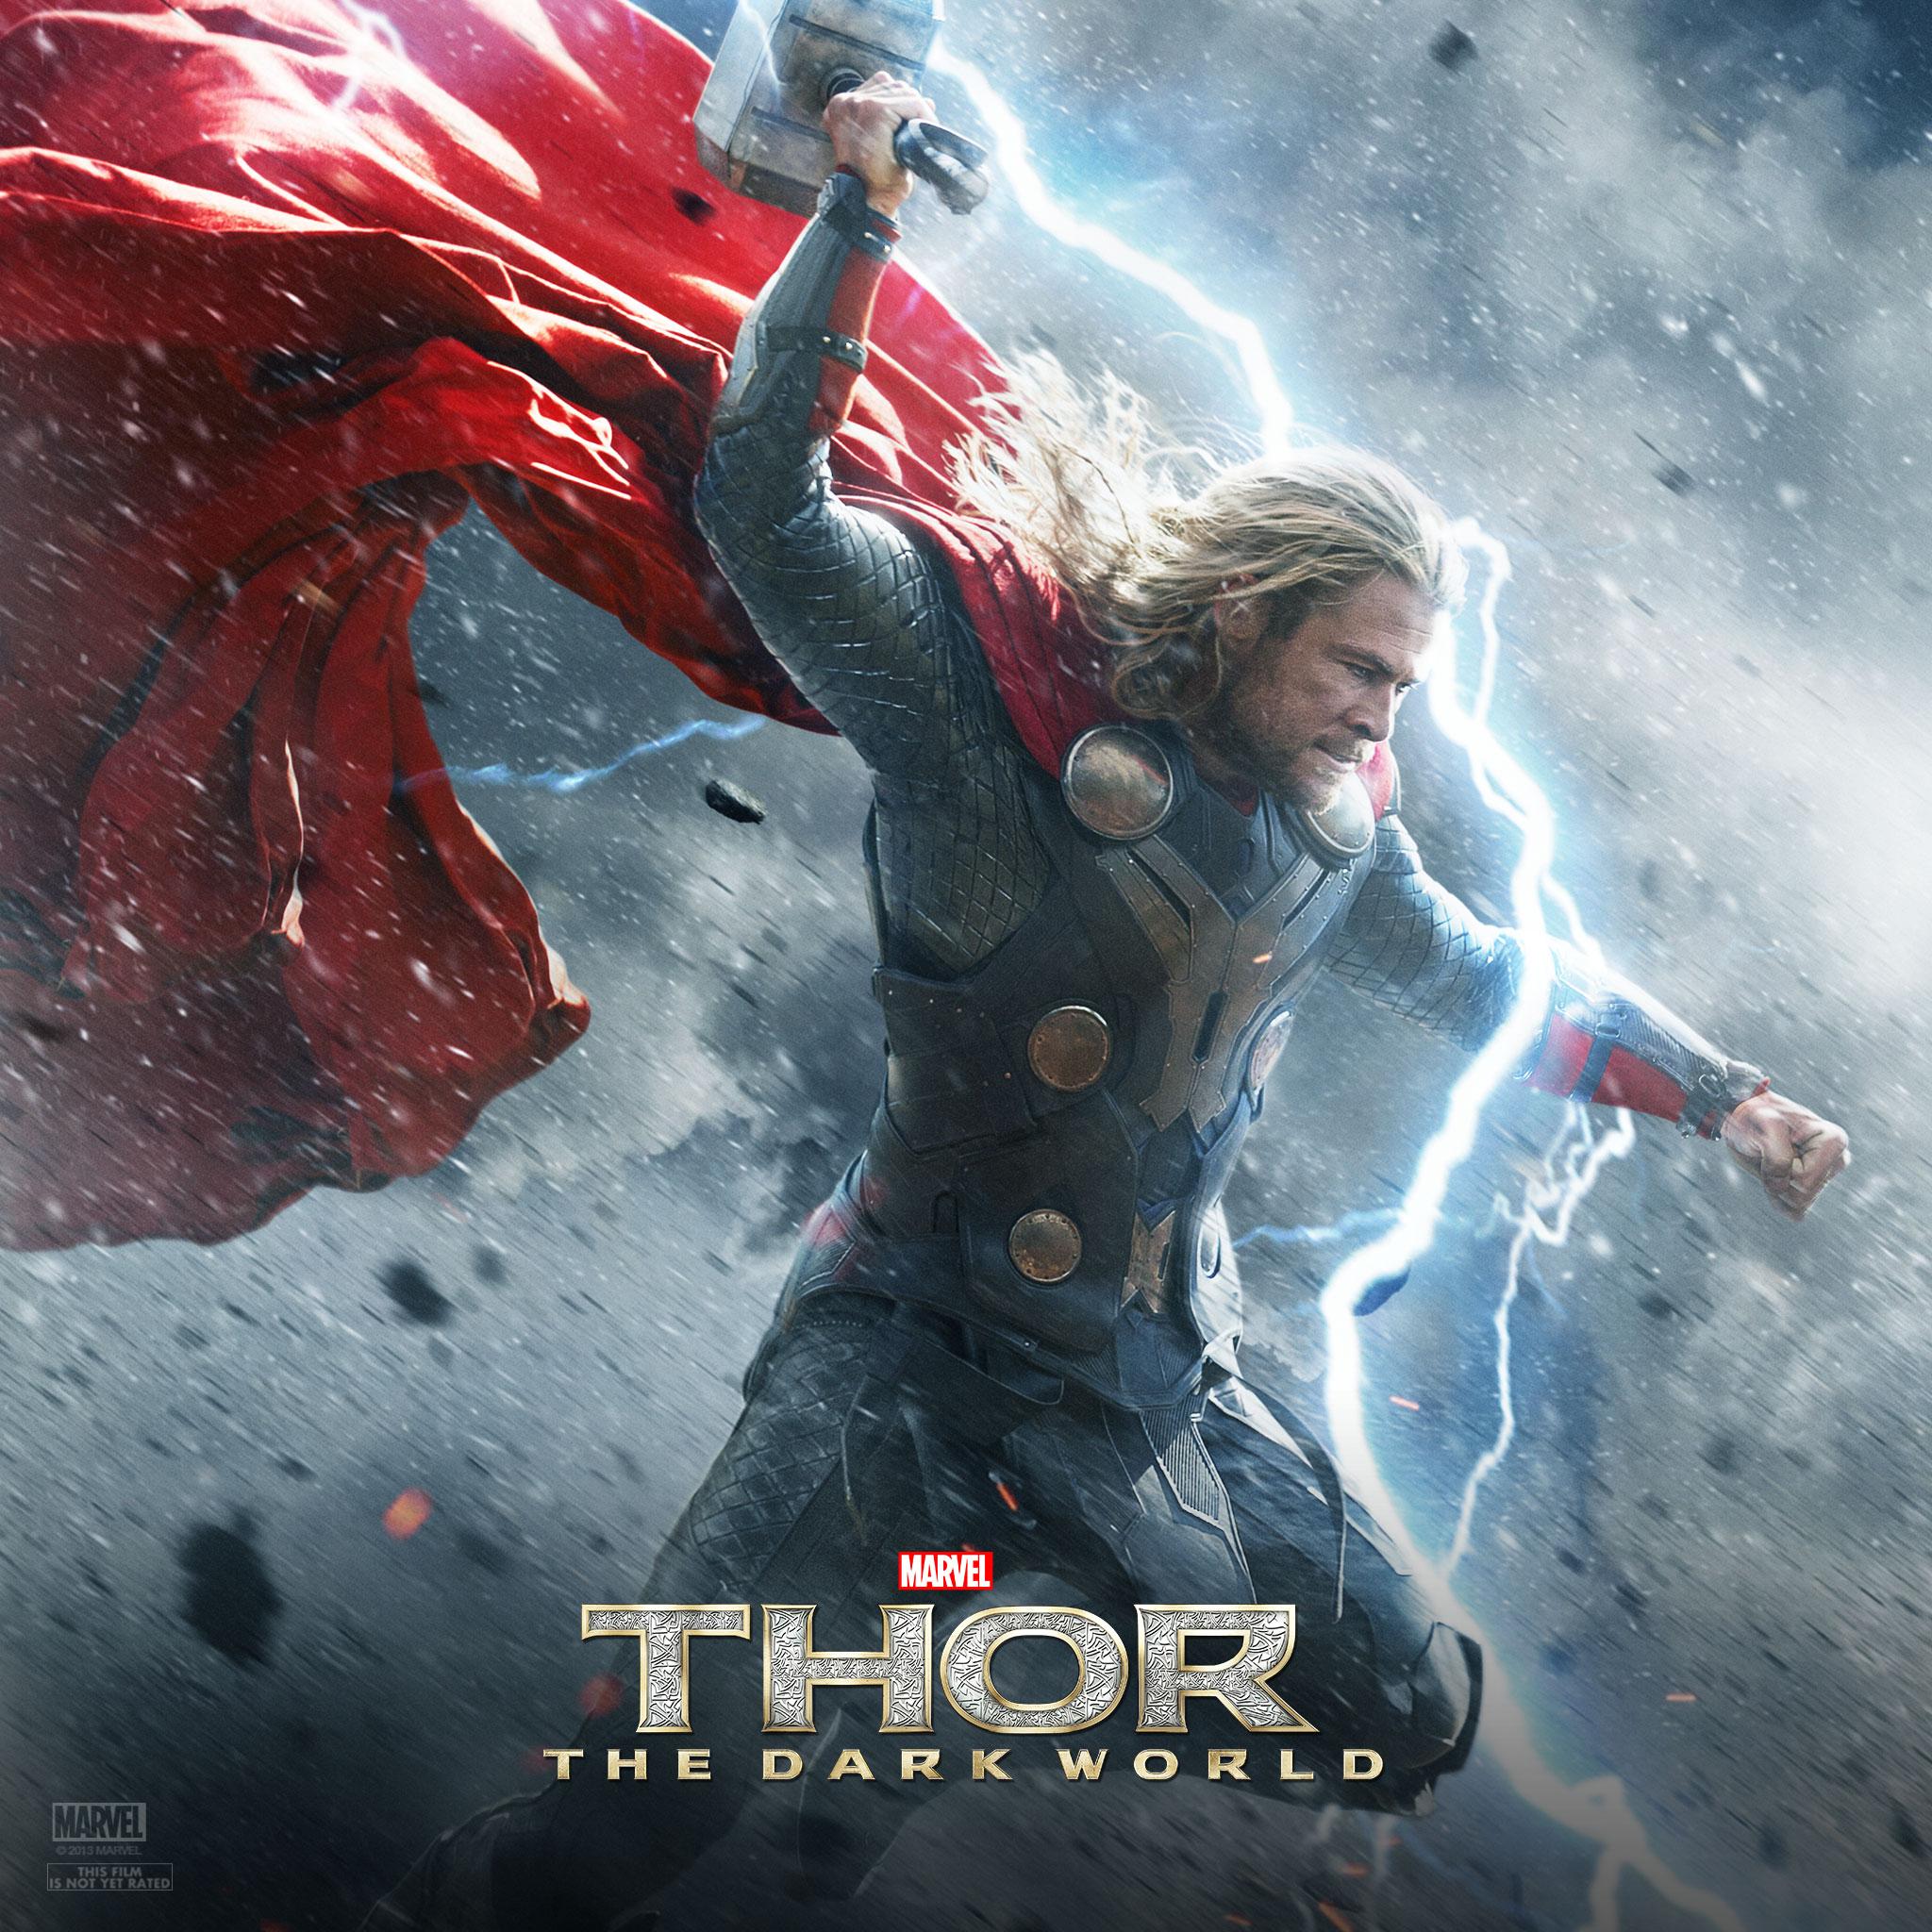 48+ Thor's Hammer Wallpaper on WallpaperSafari